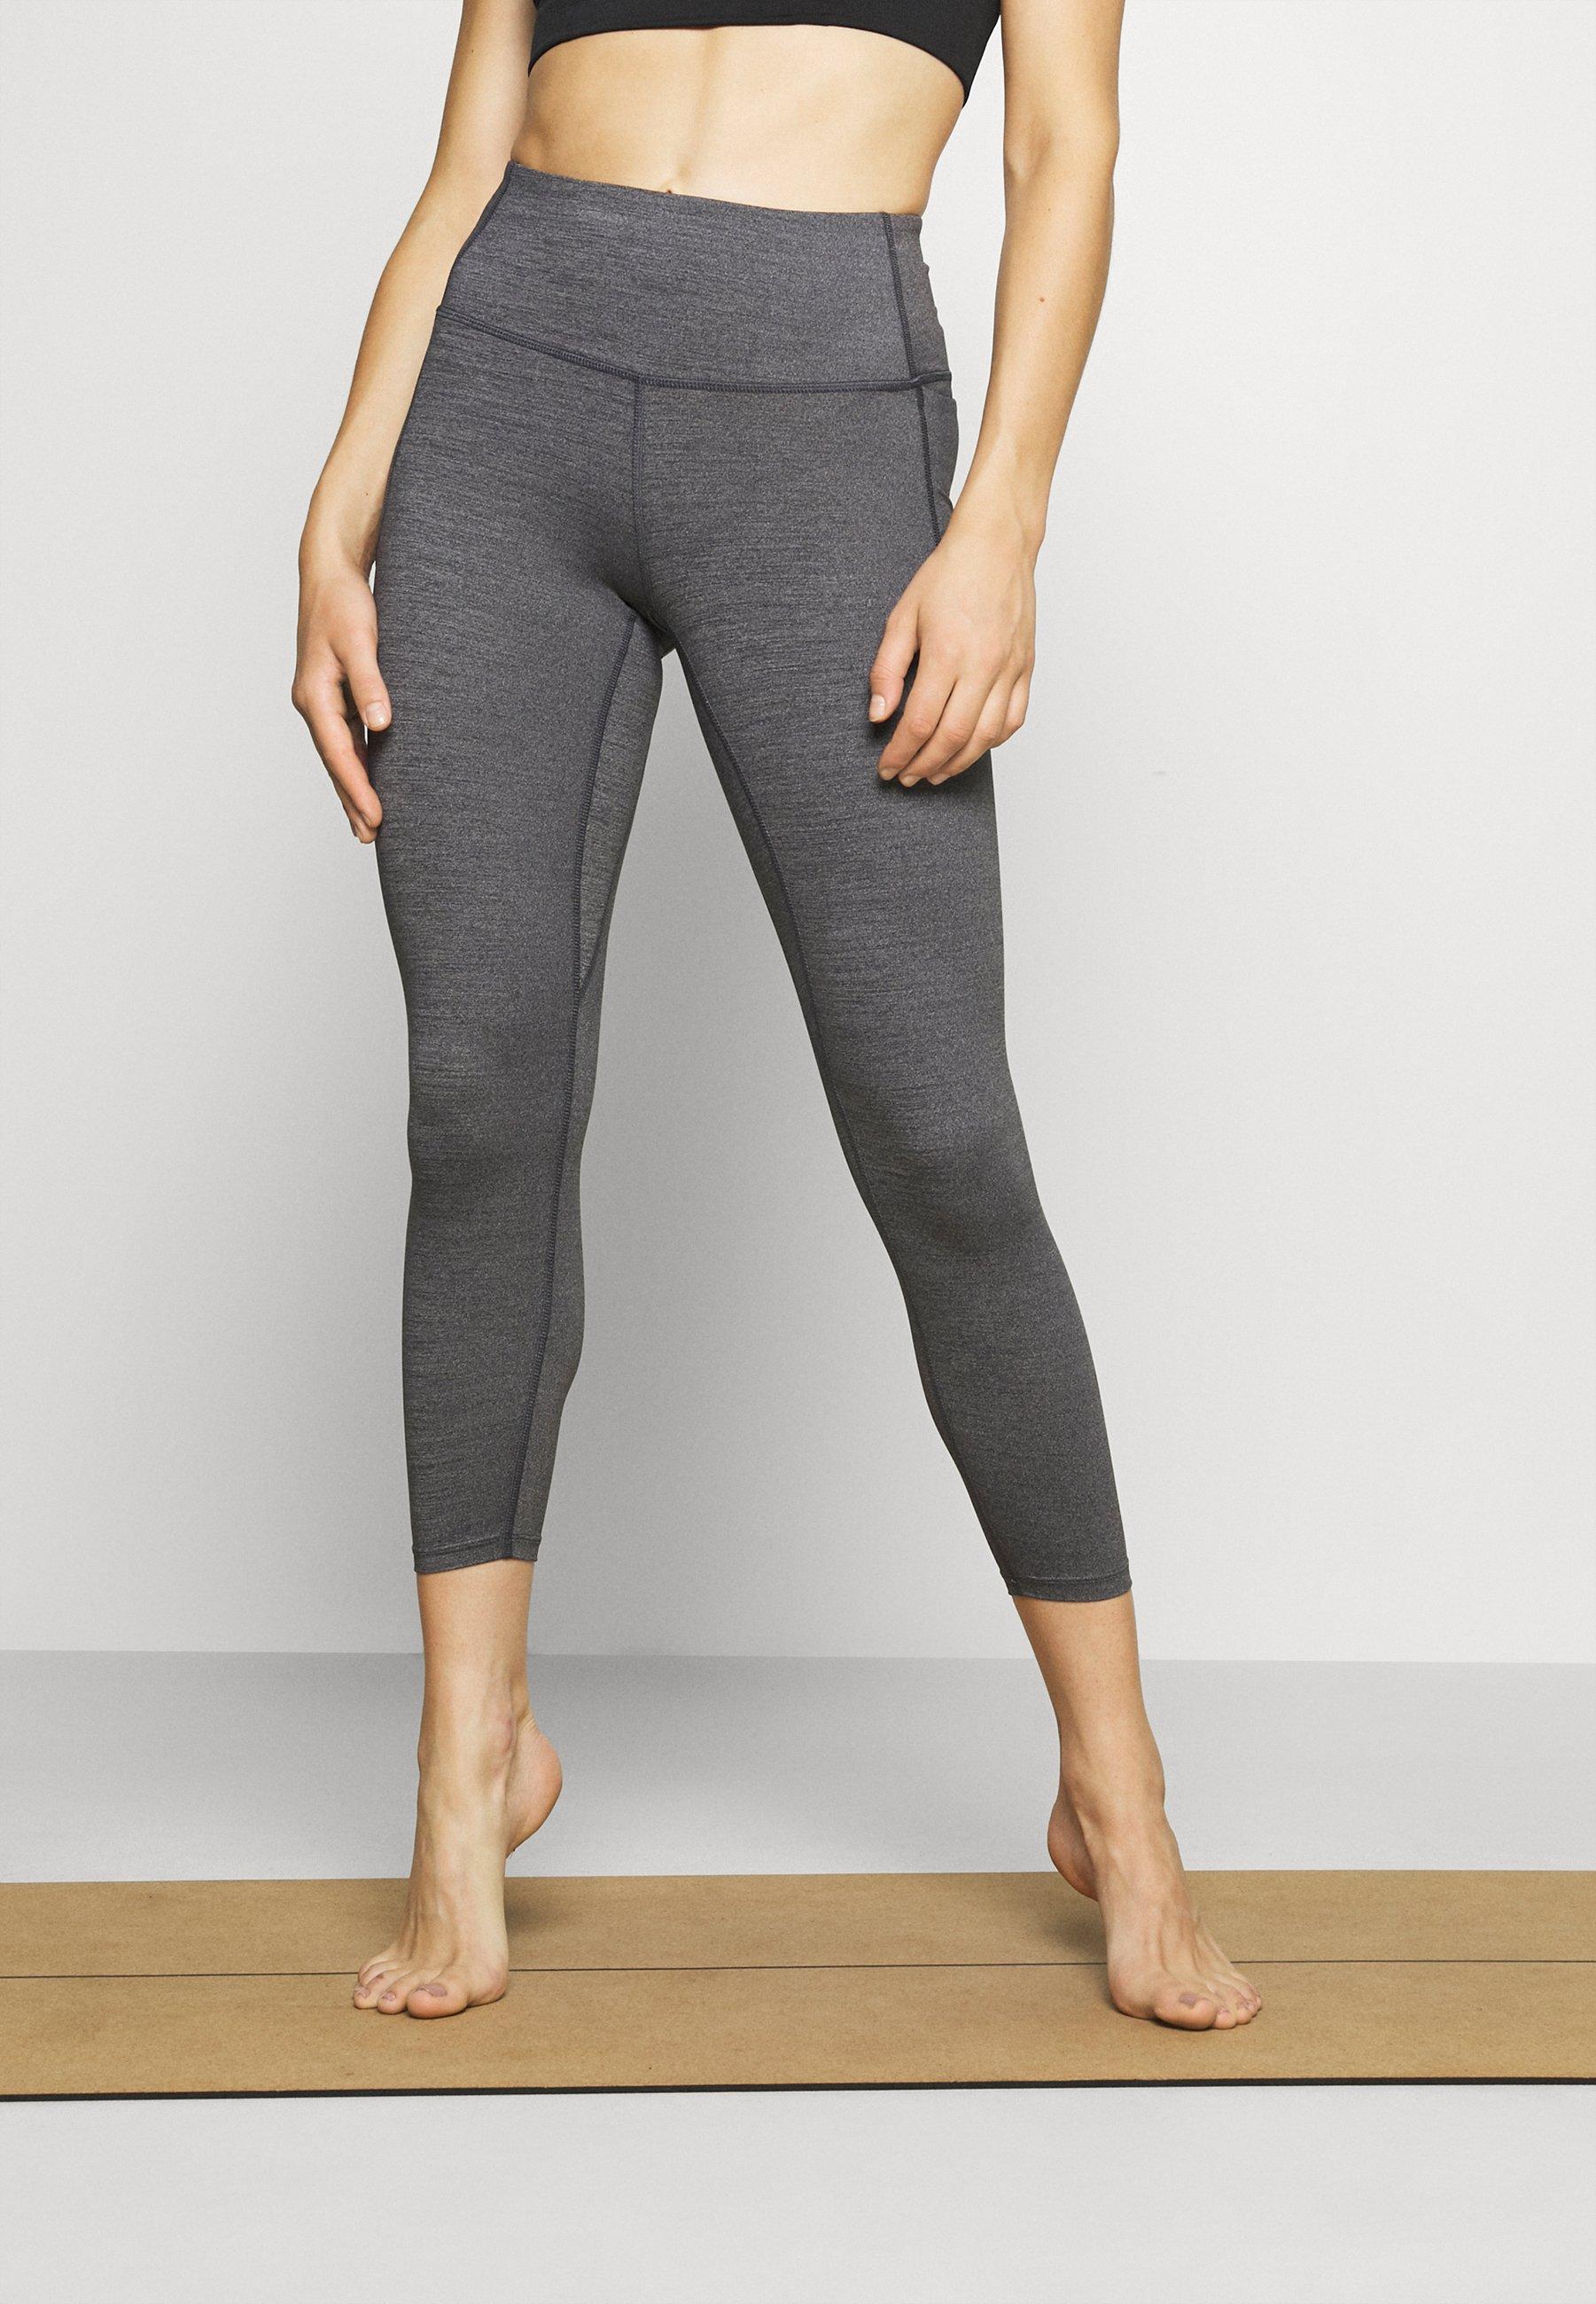 Femme MERIDIAN ANKLE LEG - Collants